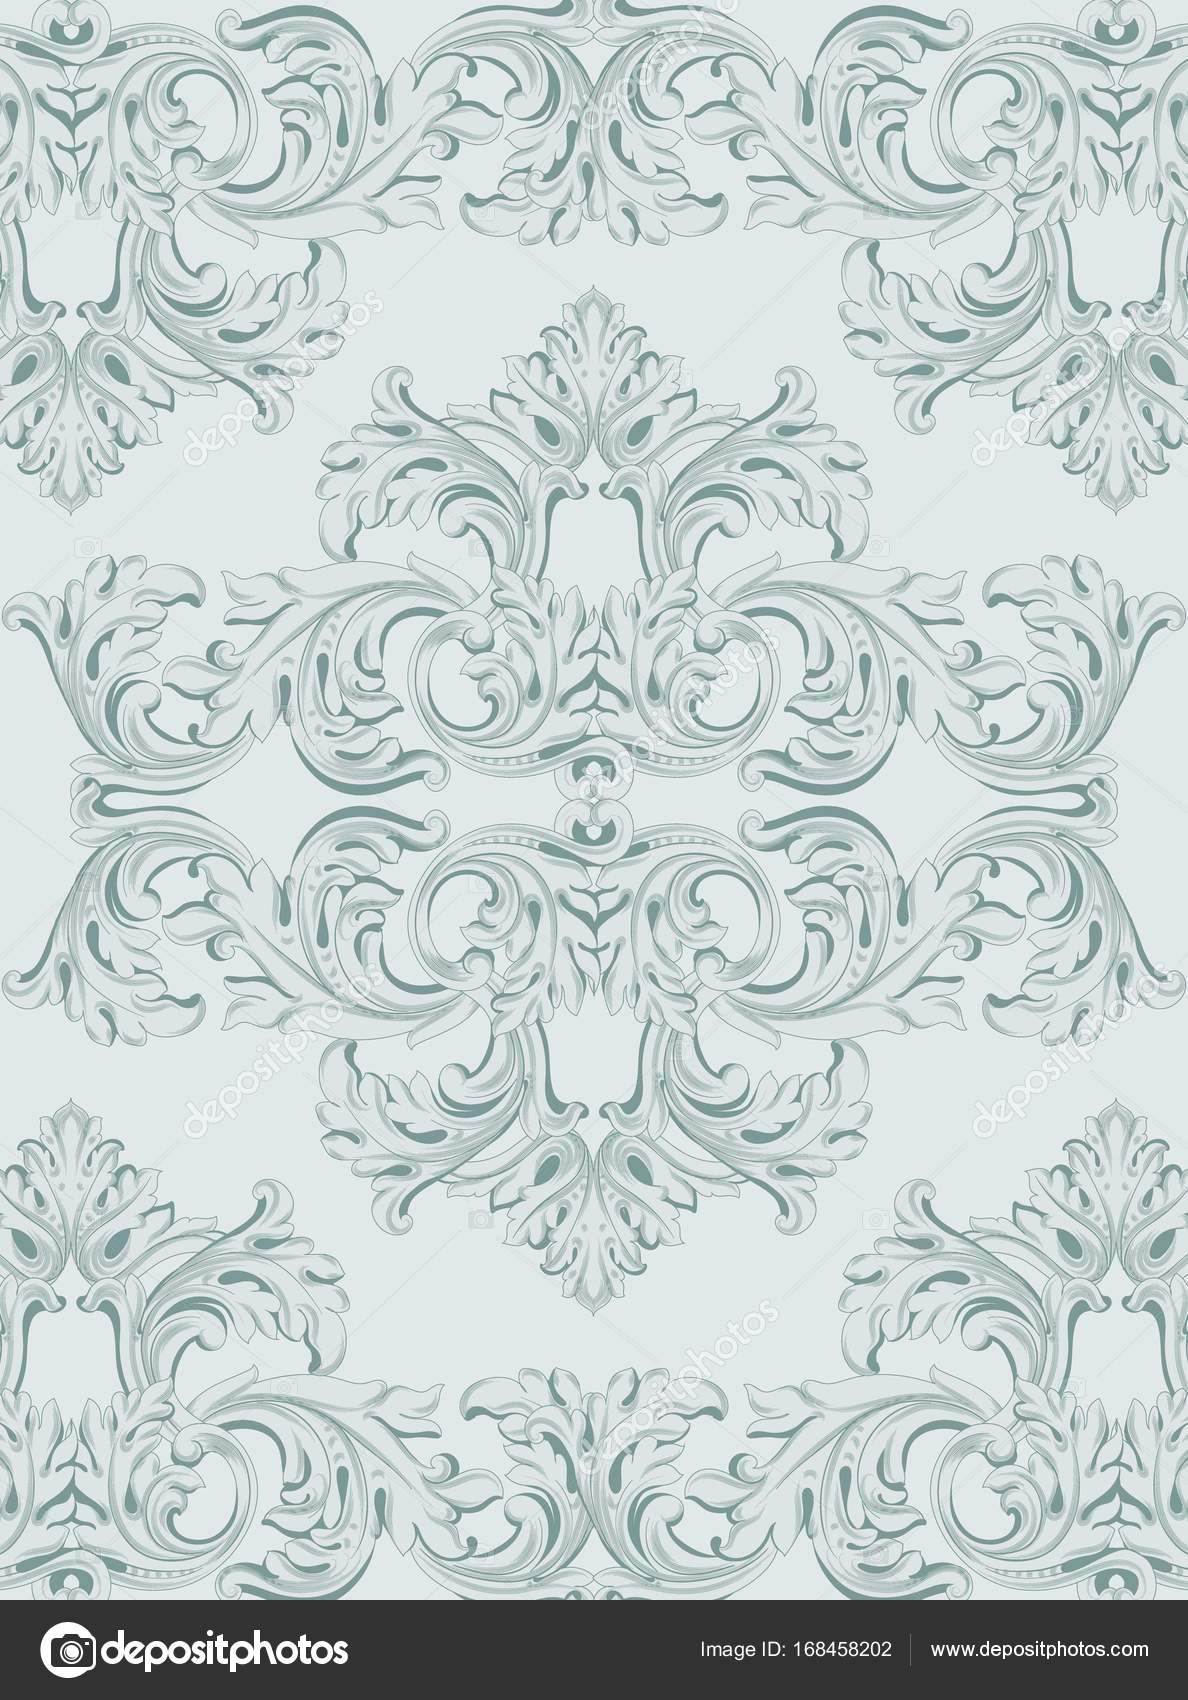 Luxury invitation card vector royal victorian pattern ornament luxury invitation card vector royal victorian pattern ornament rich rococo backgrounds blue bell stopboris Gallery